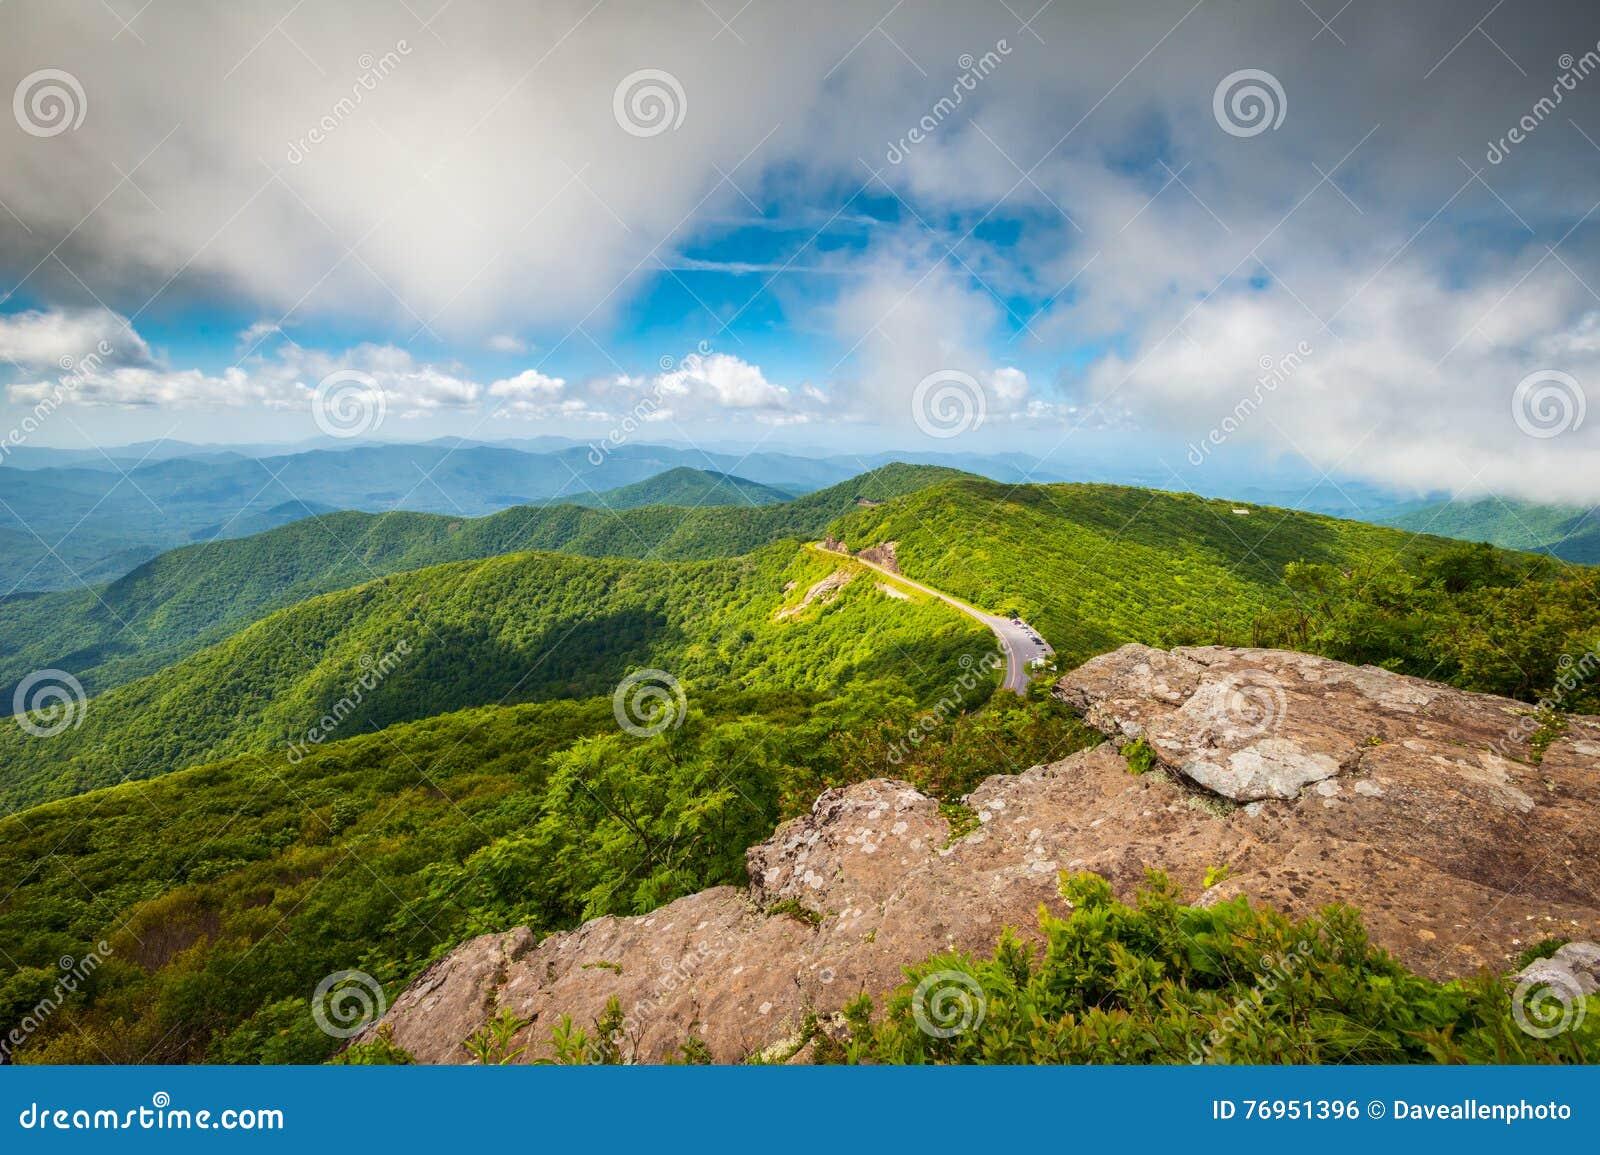 Blue Ridge Parkway North Carolina Mountains Scenic Outdoors